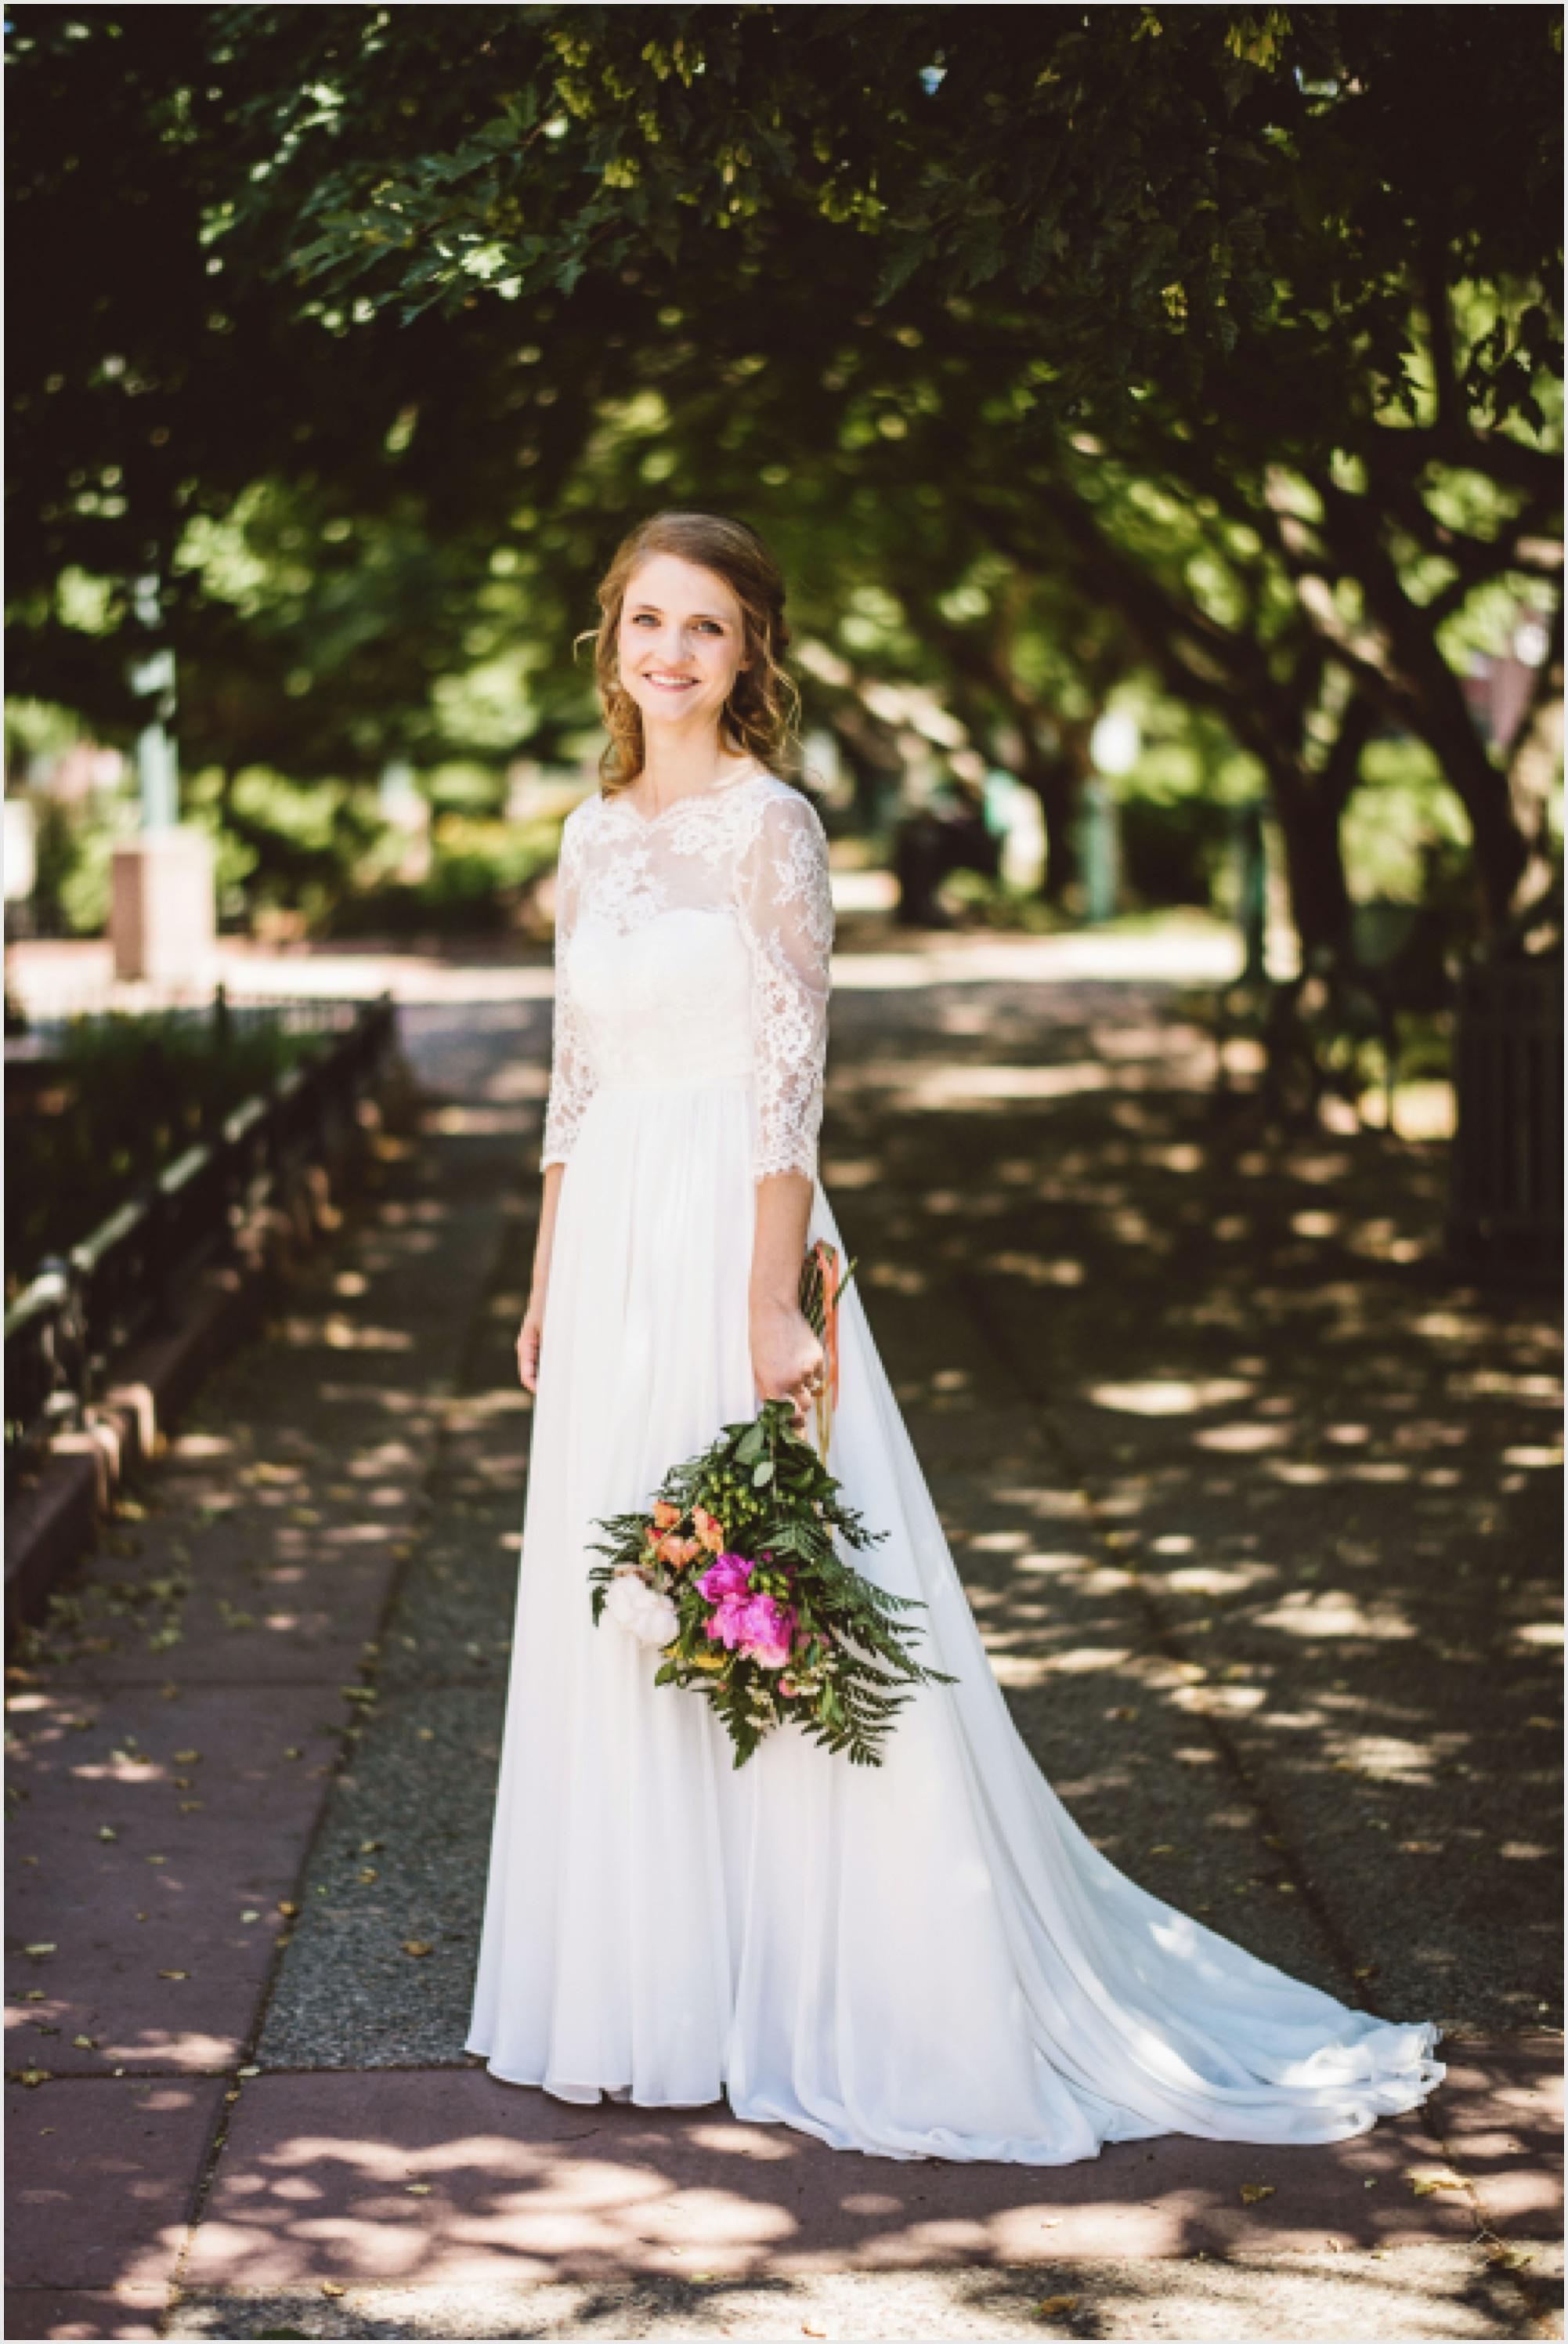 abby_taylor_minneapolis_wedding_lucas_botz_photography_148.jpg